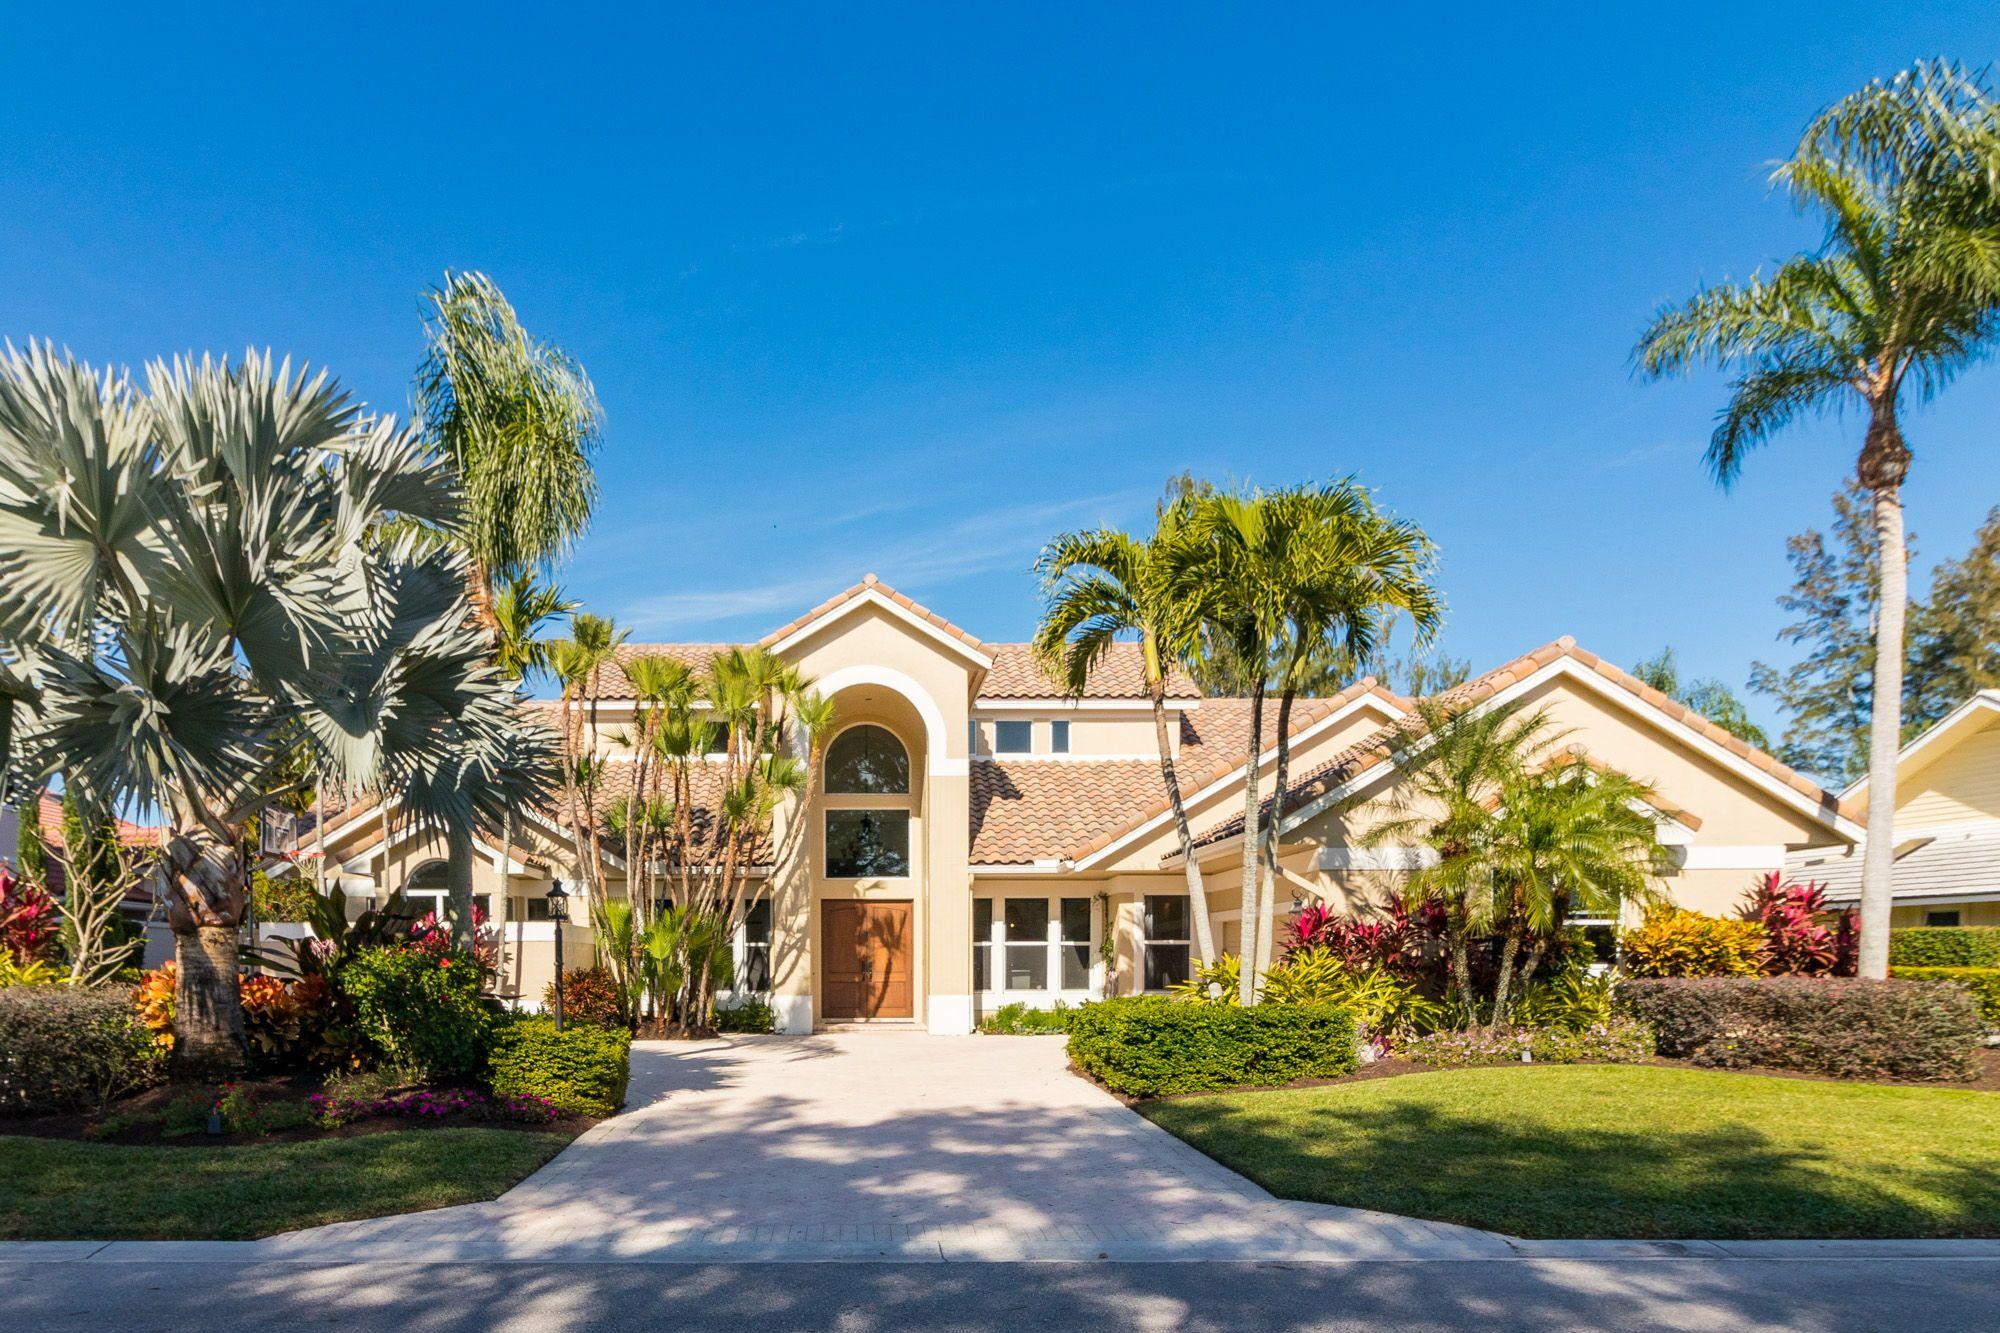 Magnificent Golf Garden Views Surround This Gorgeously Updated One Story 5 Bd 4 Ba Den Pool Home W A Detac Palm Beach Gardens Garden View Palm Beach County